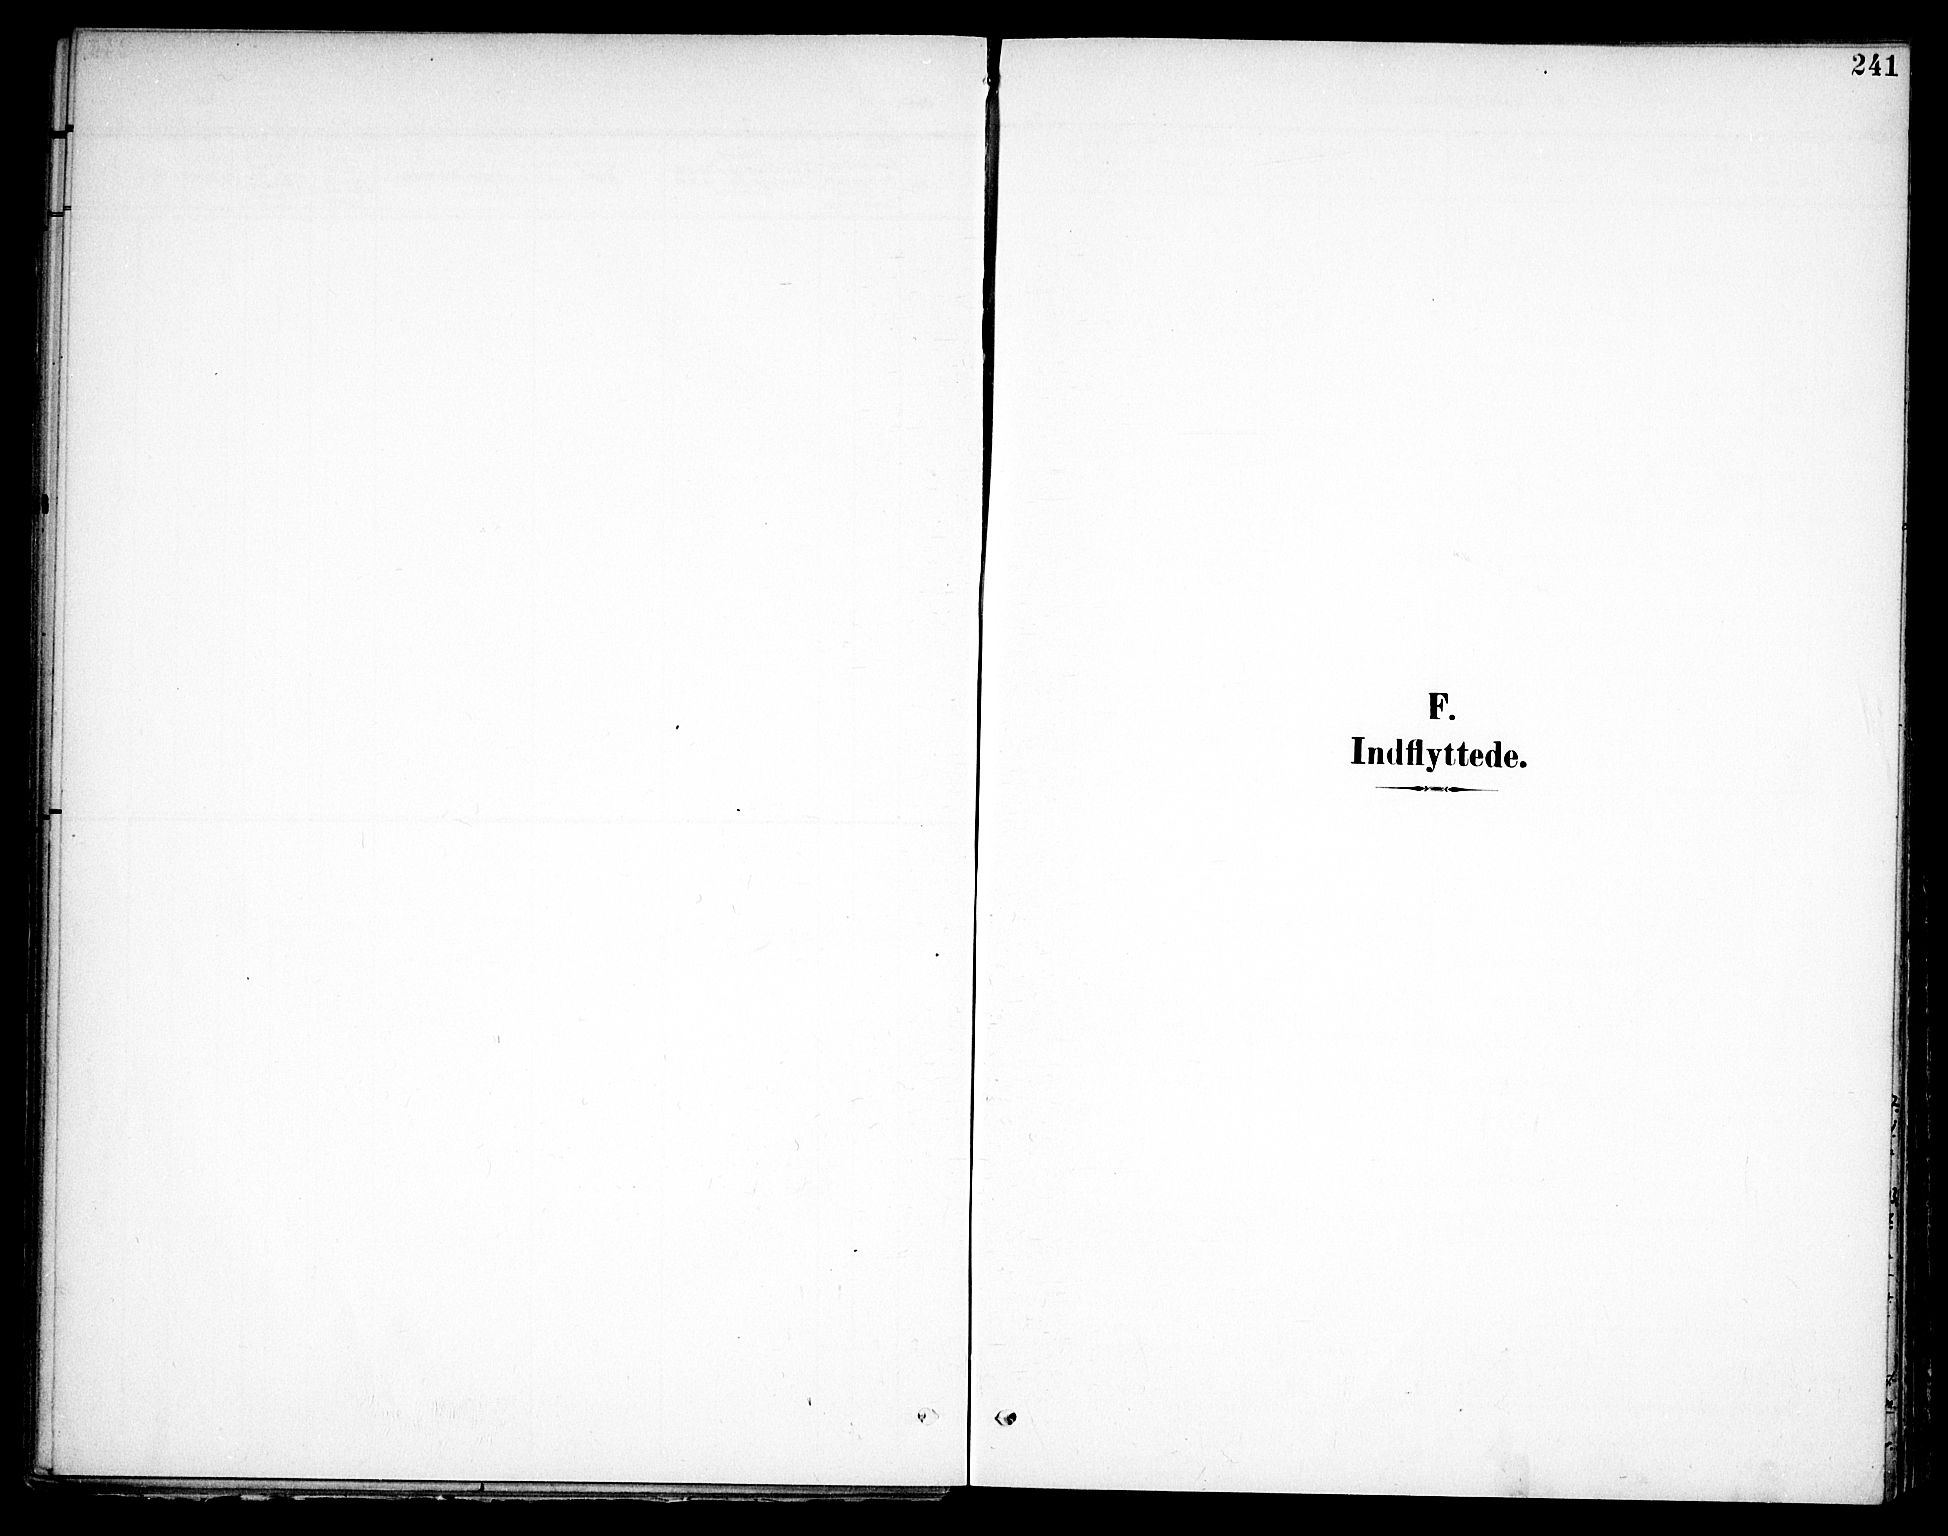 SAO, Høland prestekontor Kirkebøker, F/Fa/L0015: Ministerialbok nr. I 15, 1897-1912, s. 241